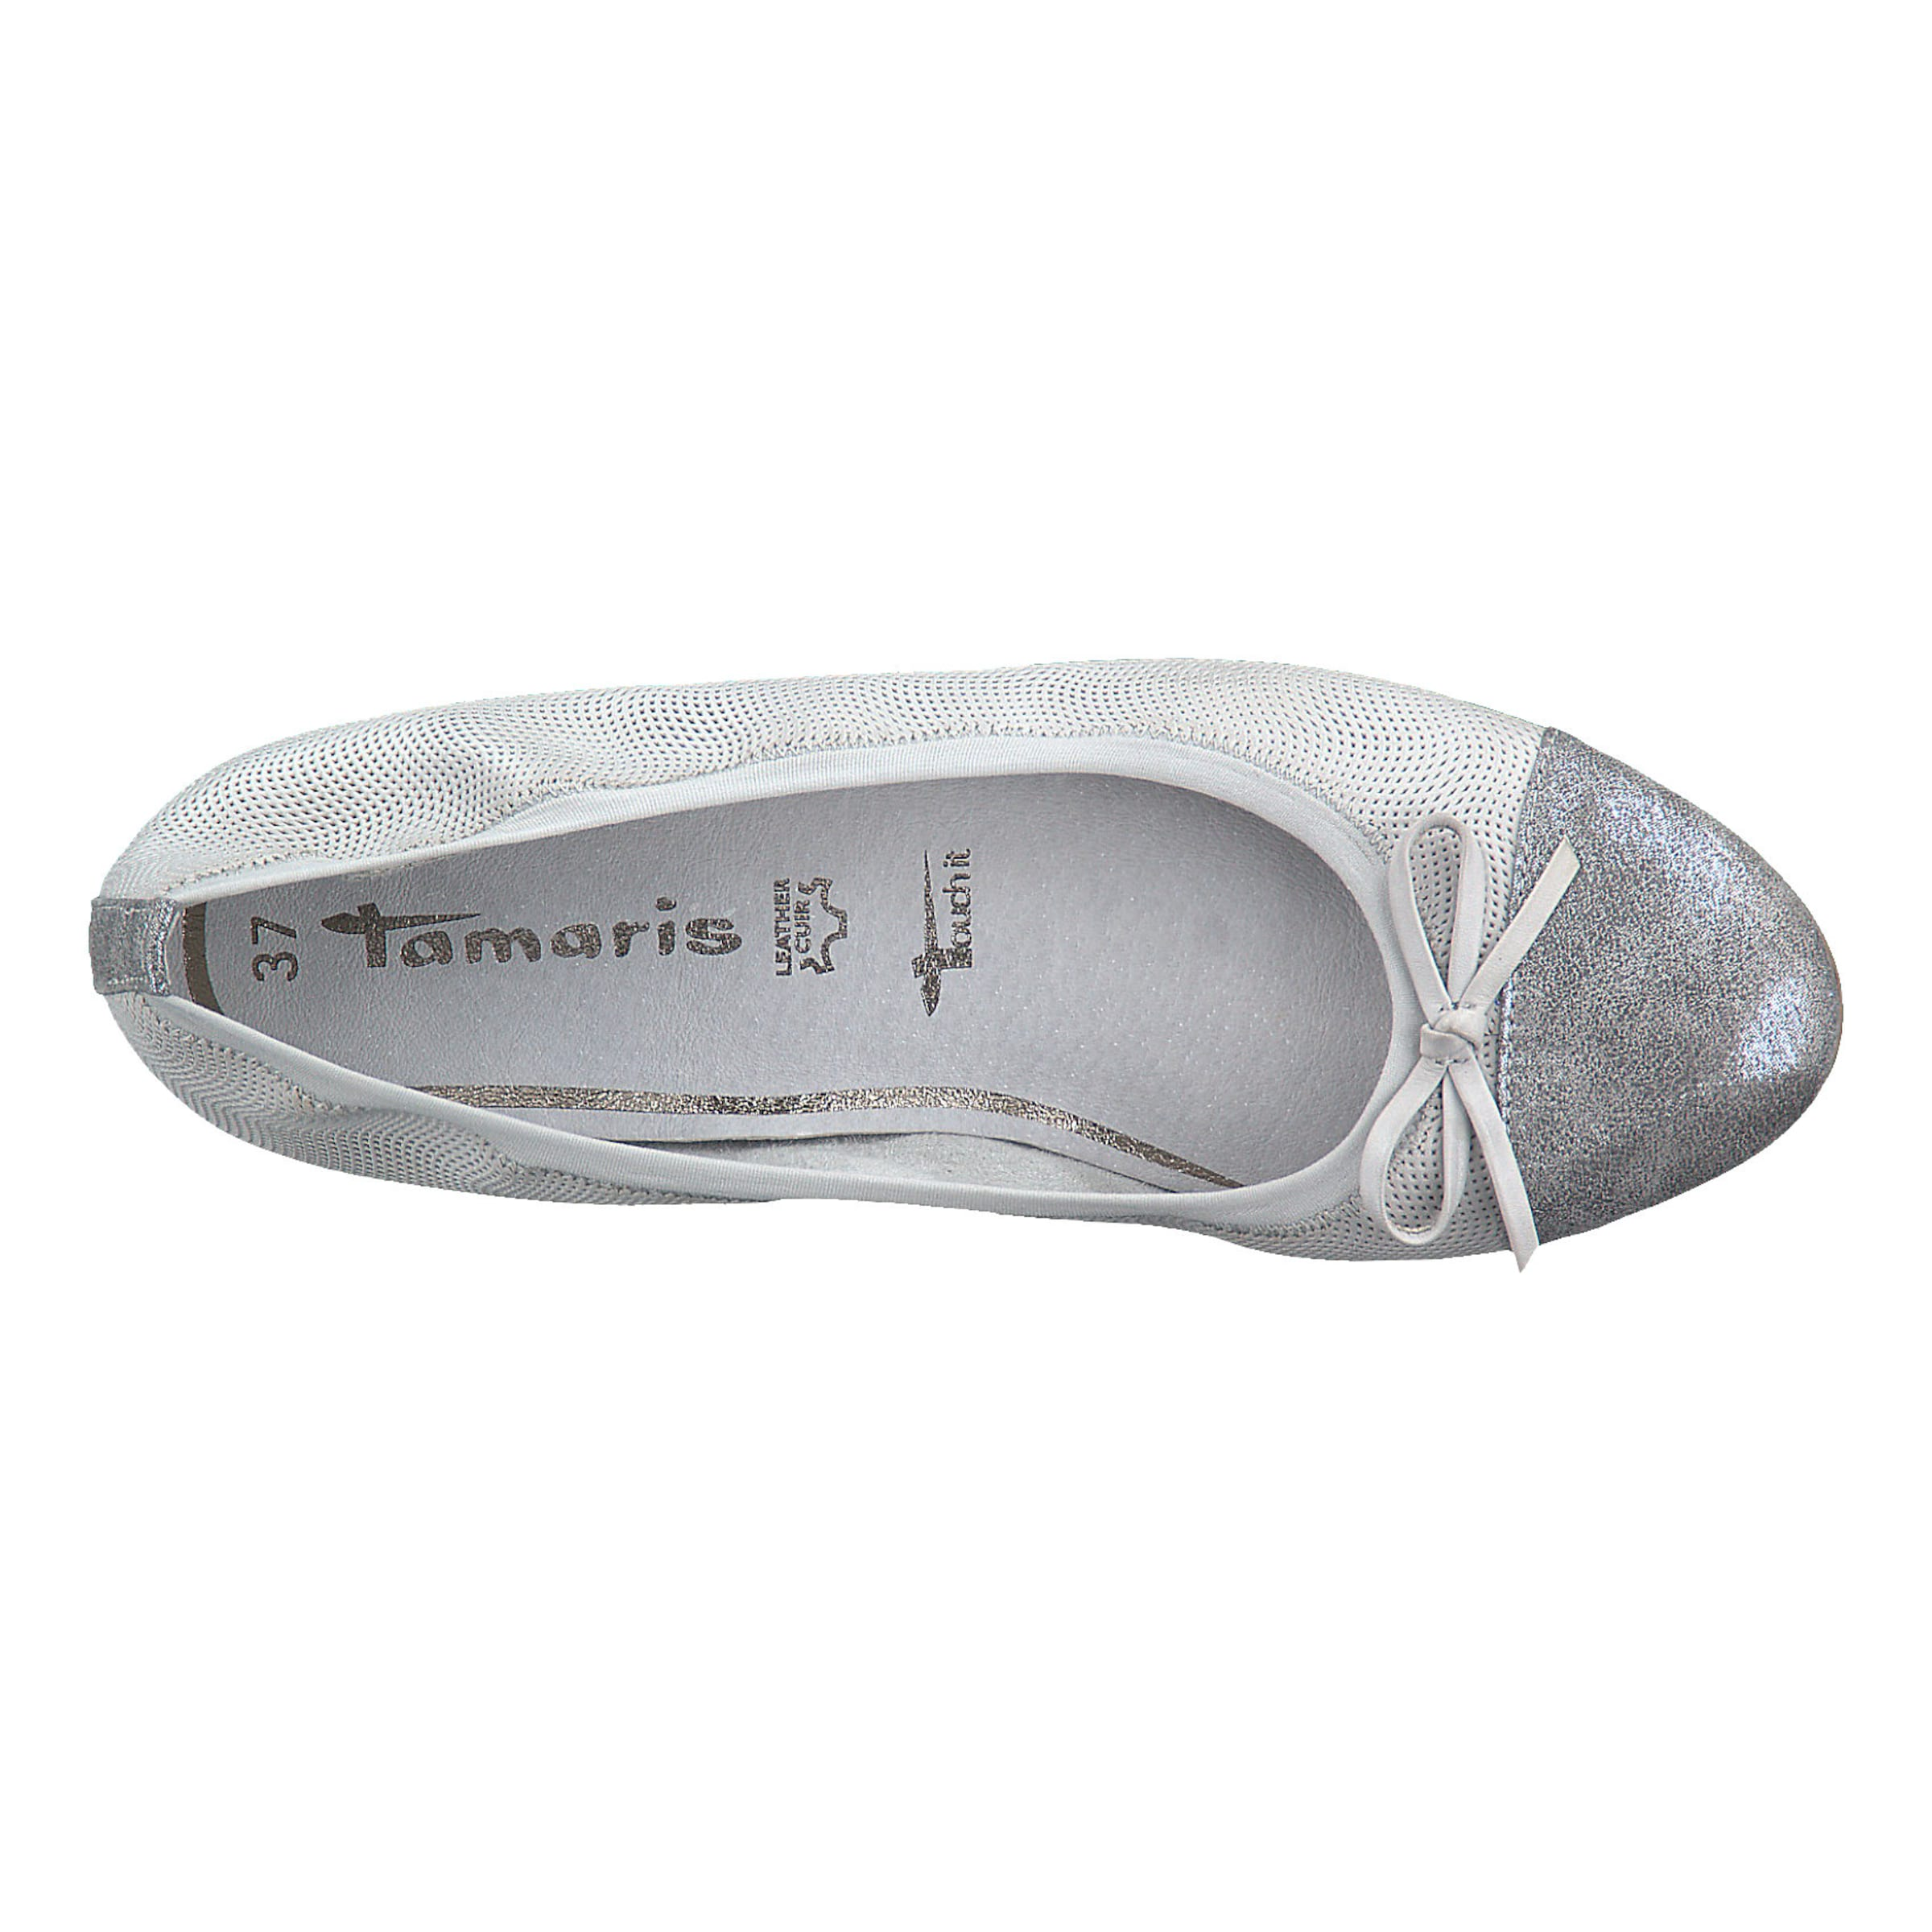 TAMARIS Rabatt Ballerinas Leder, Textil Großer Rabatt TAMARIS 94abcc